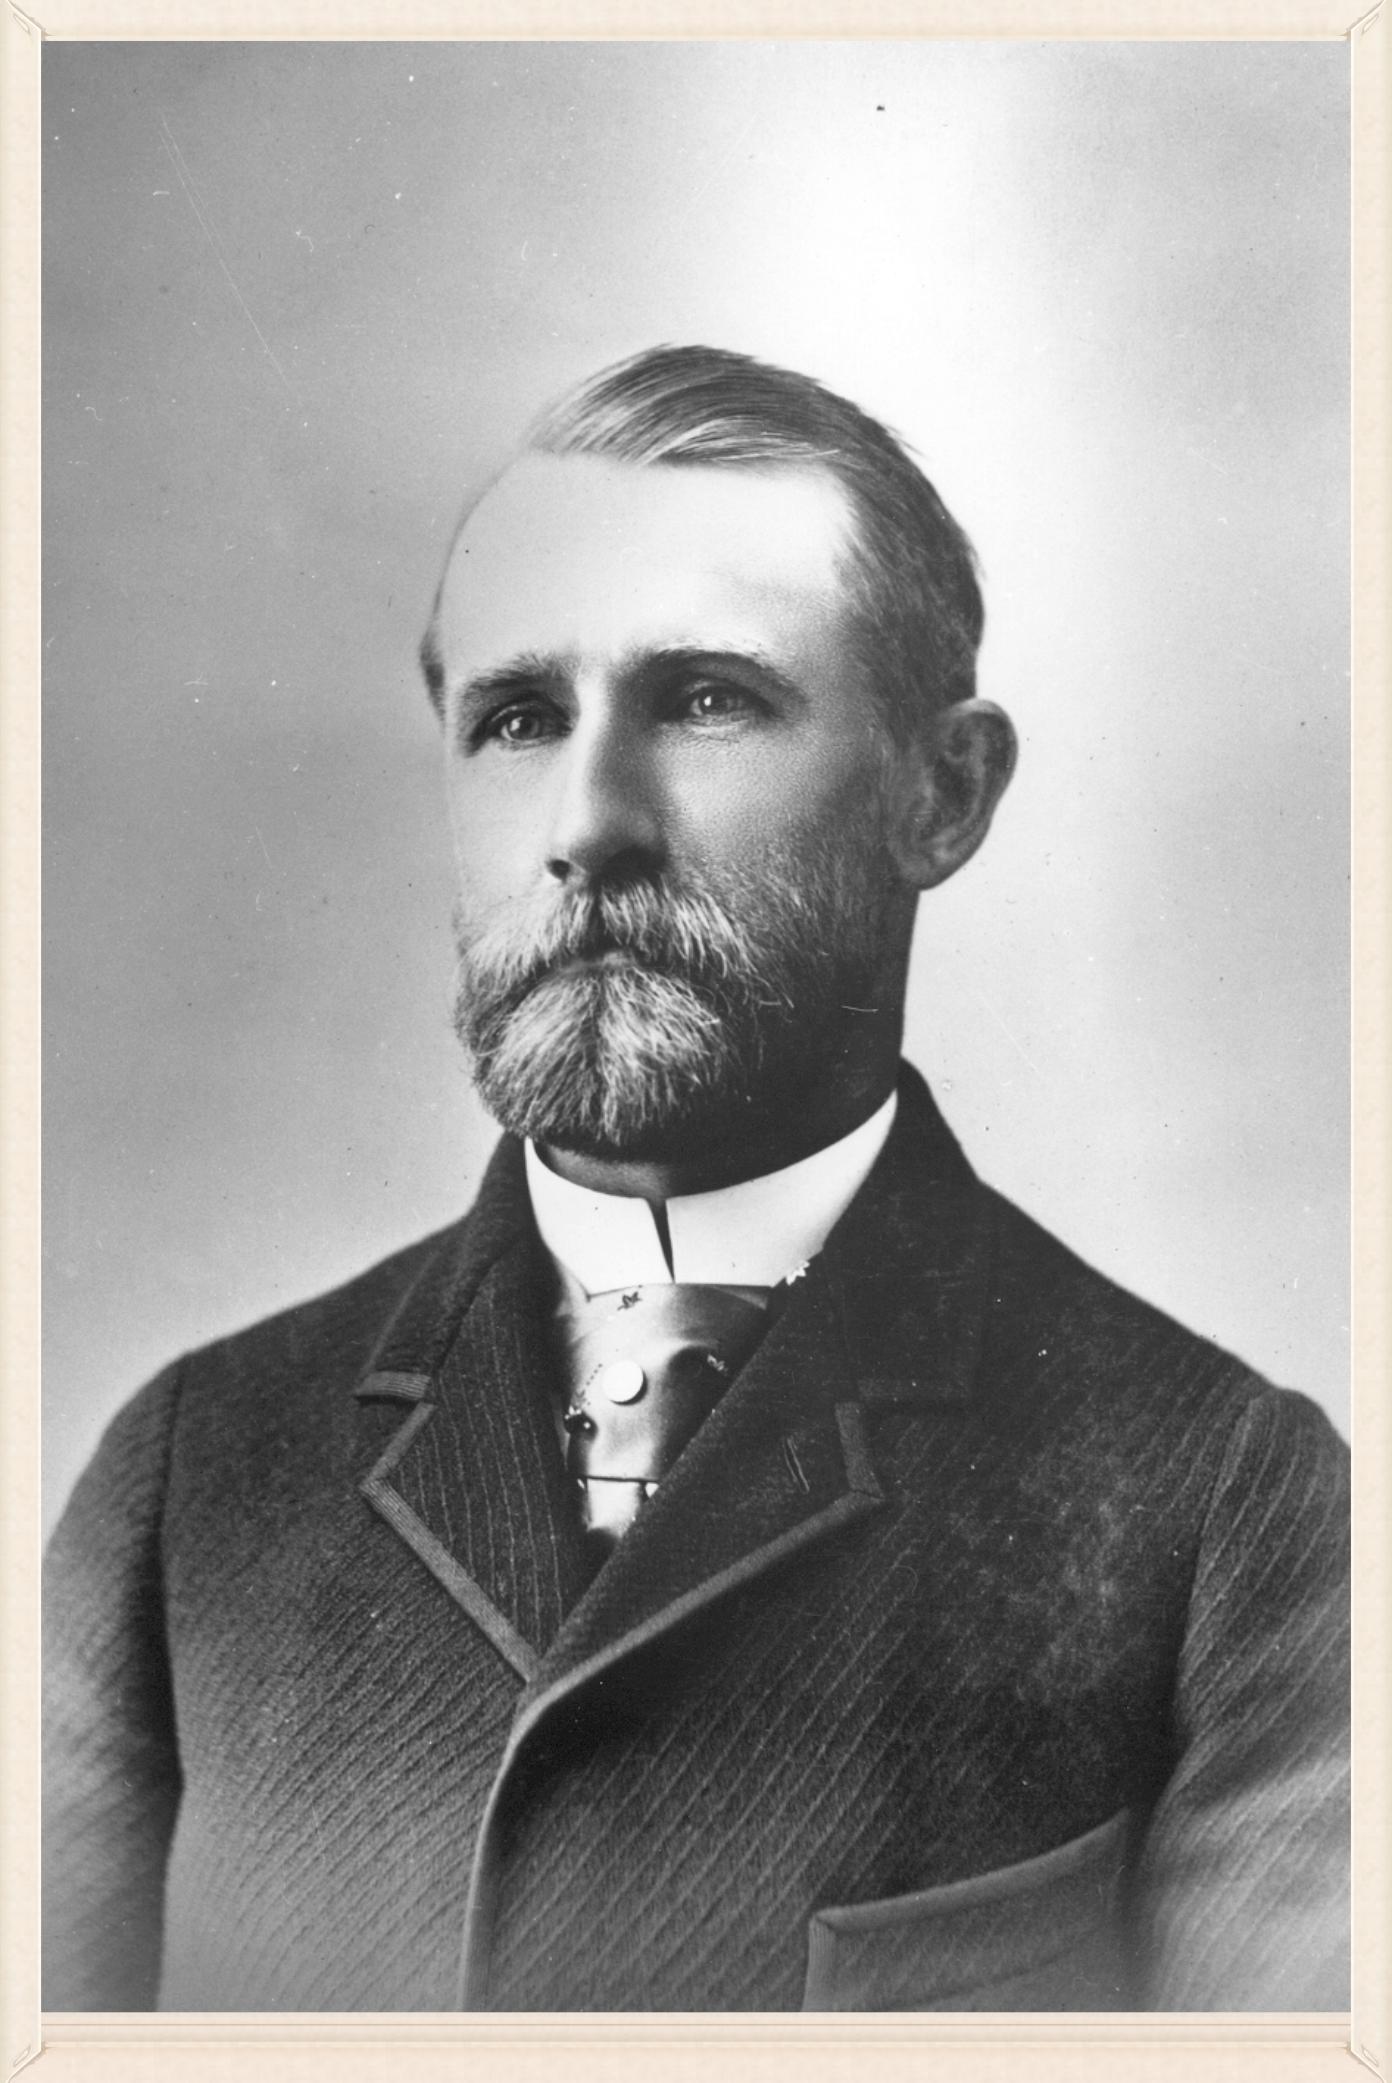 William E. Hazeltine